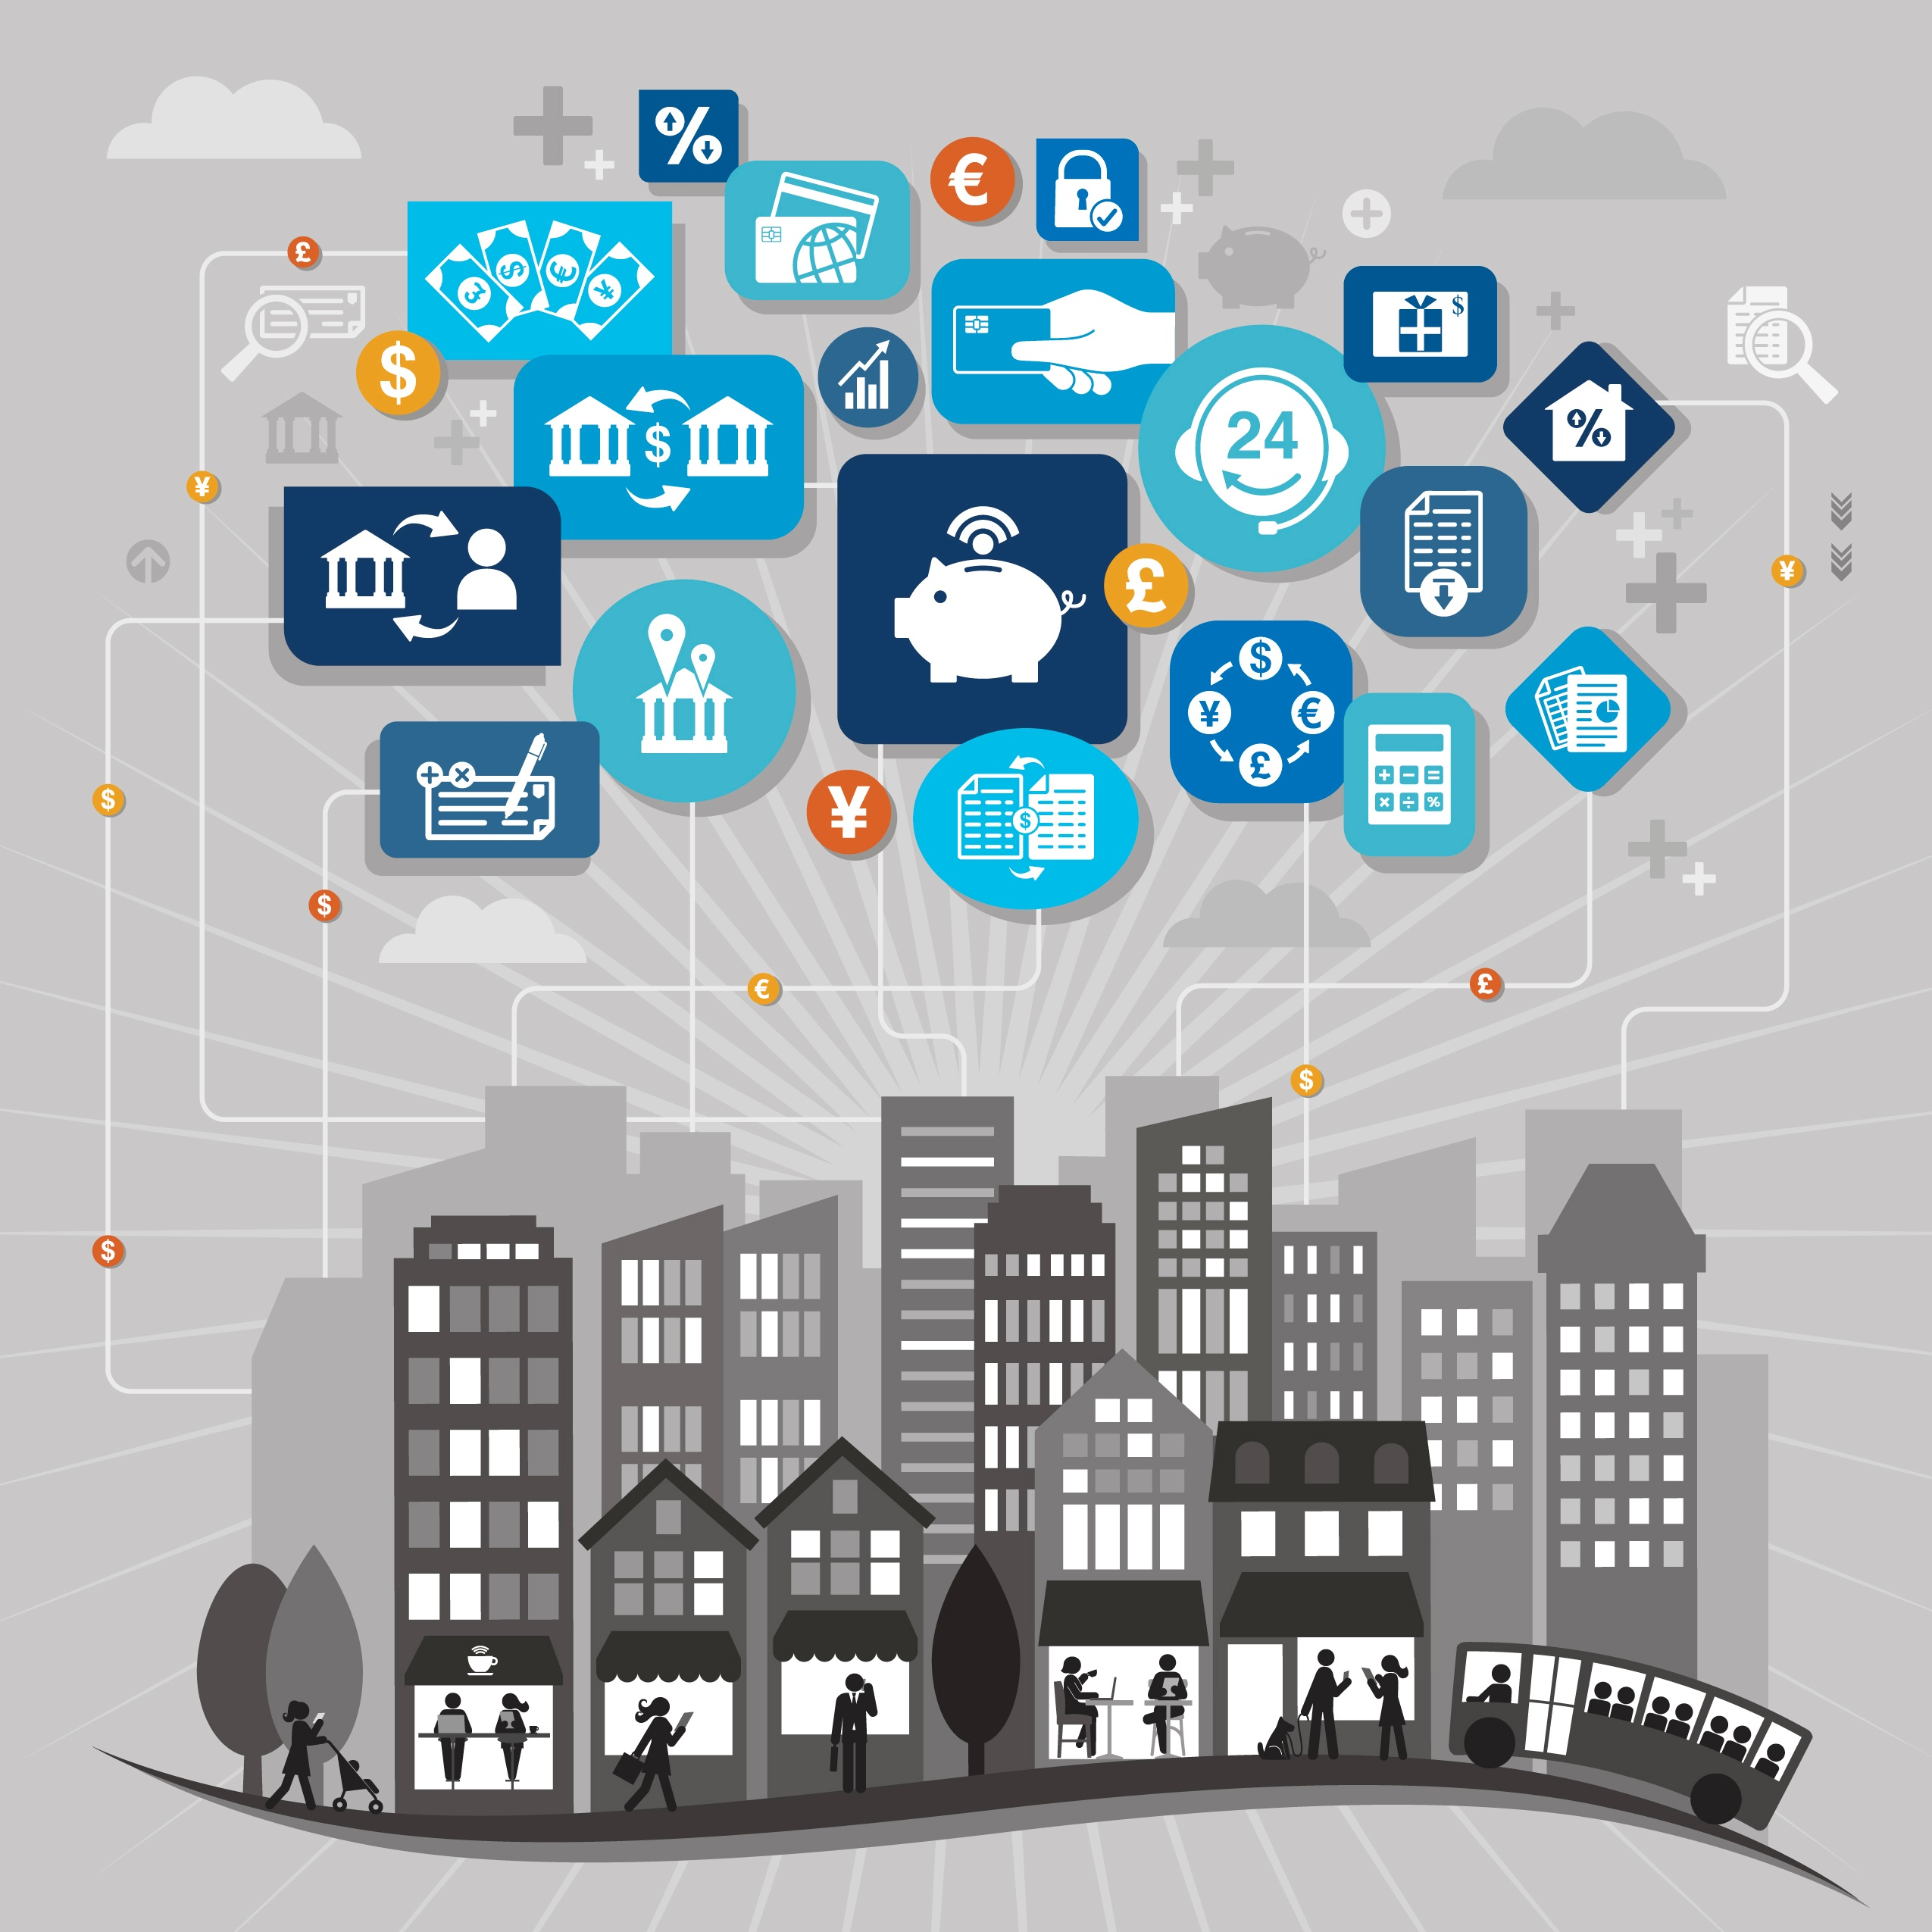 Internet_of_things-_Retail_Banking_-_Bank_of_Things